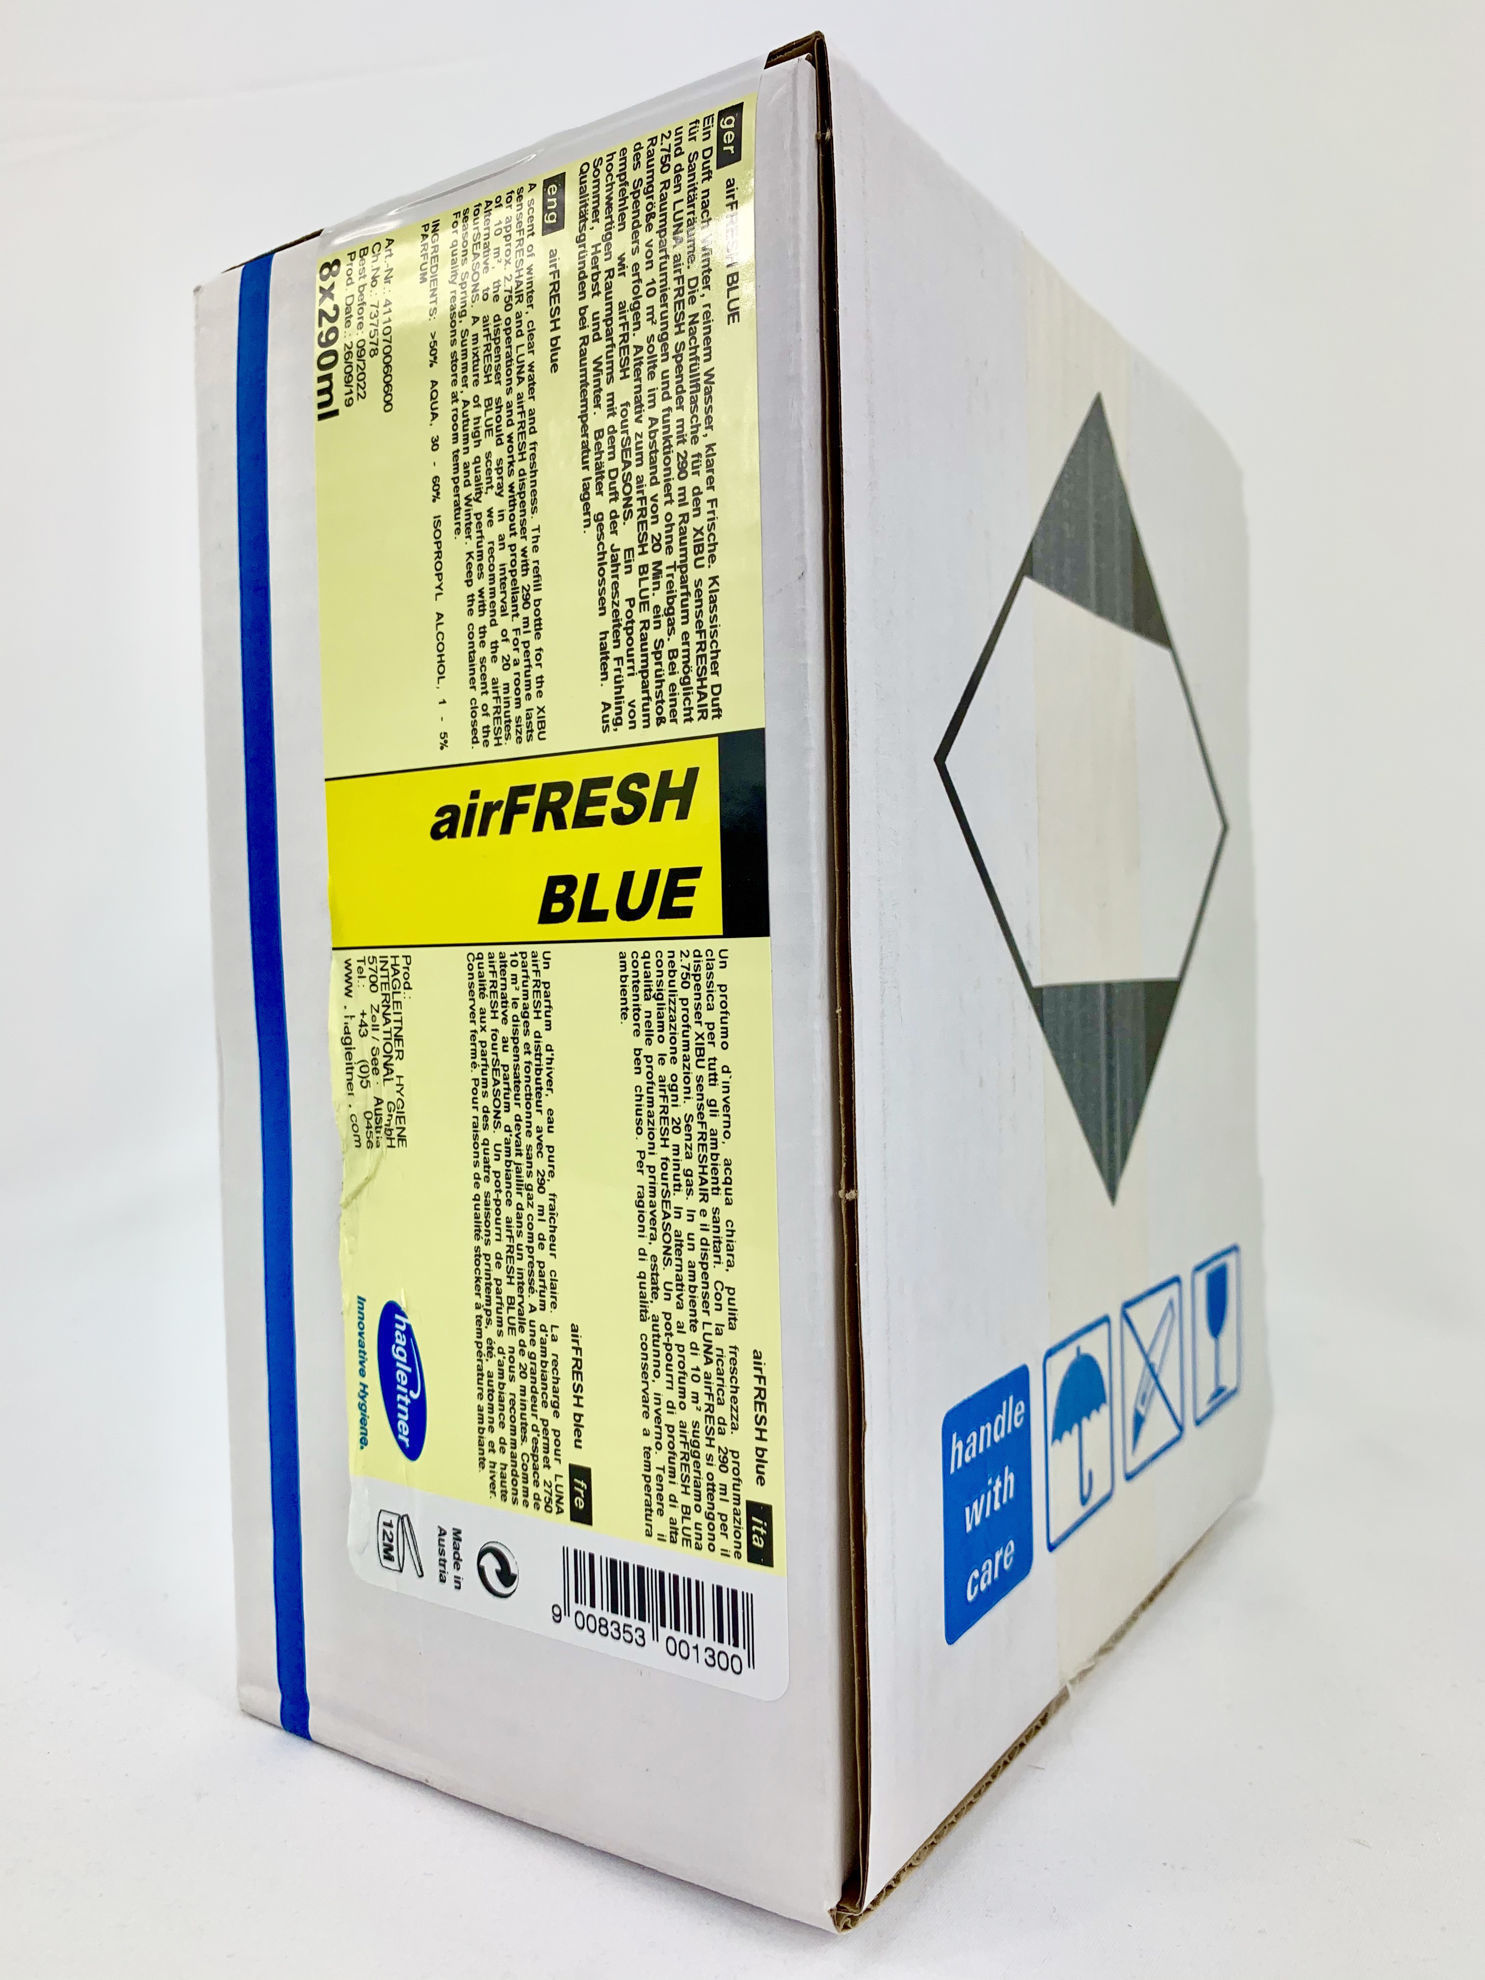 Picture of LUNA airFRESH blue 300ml